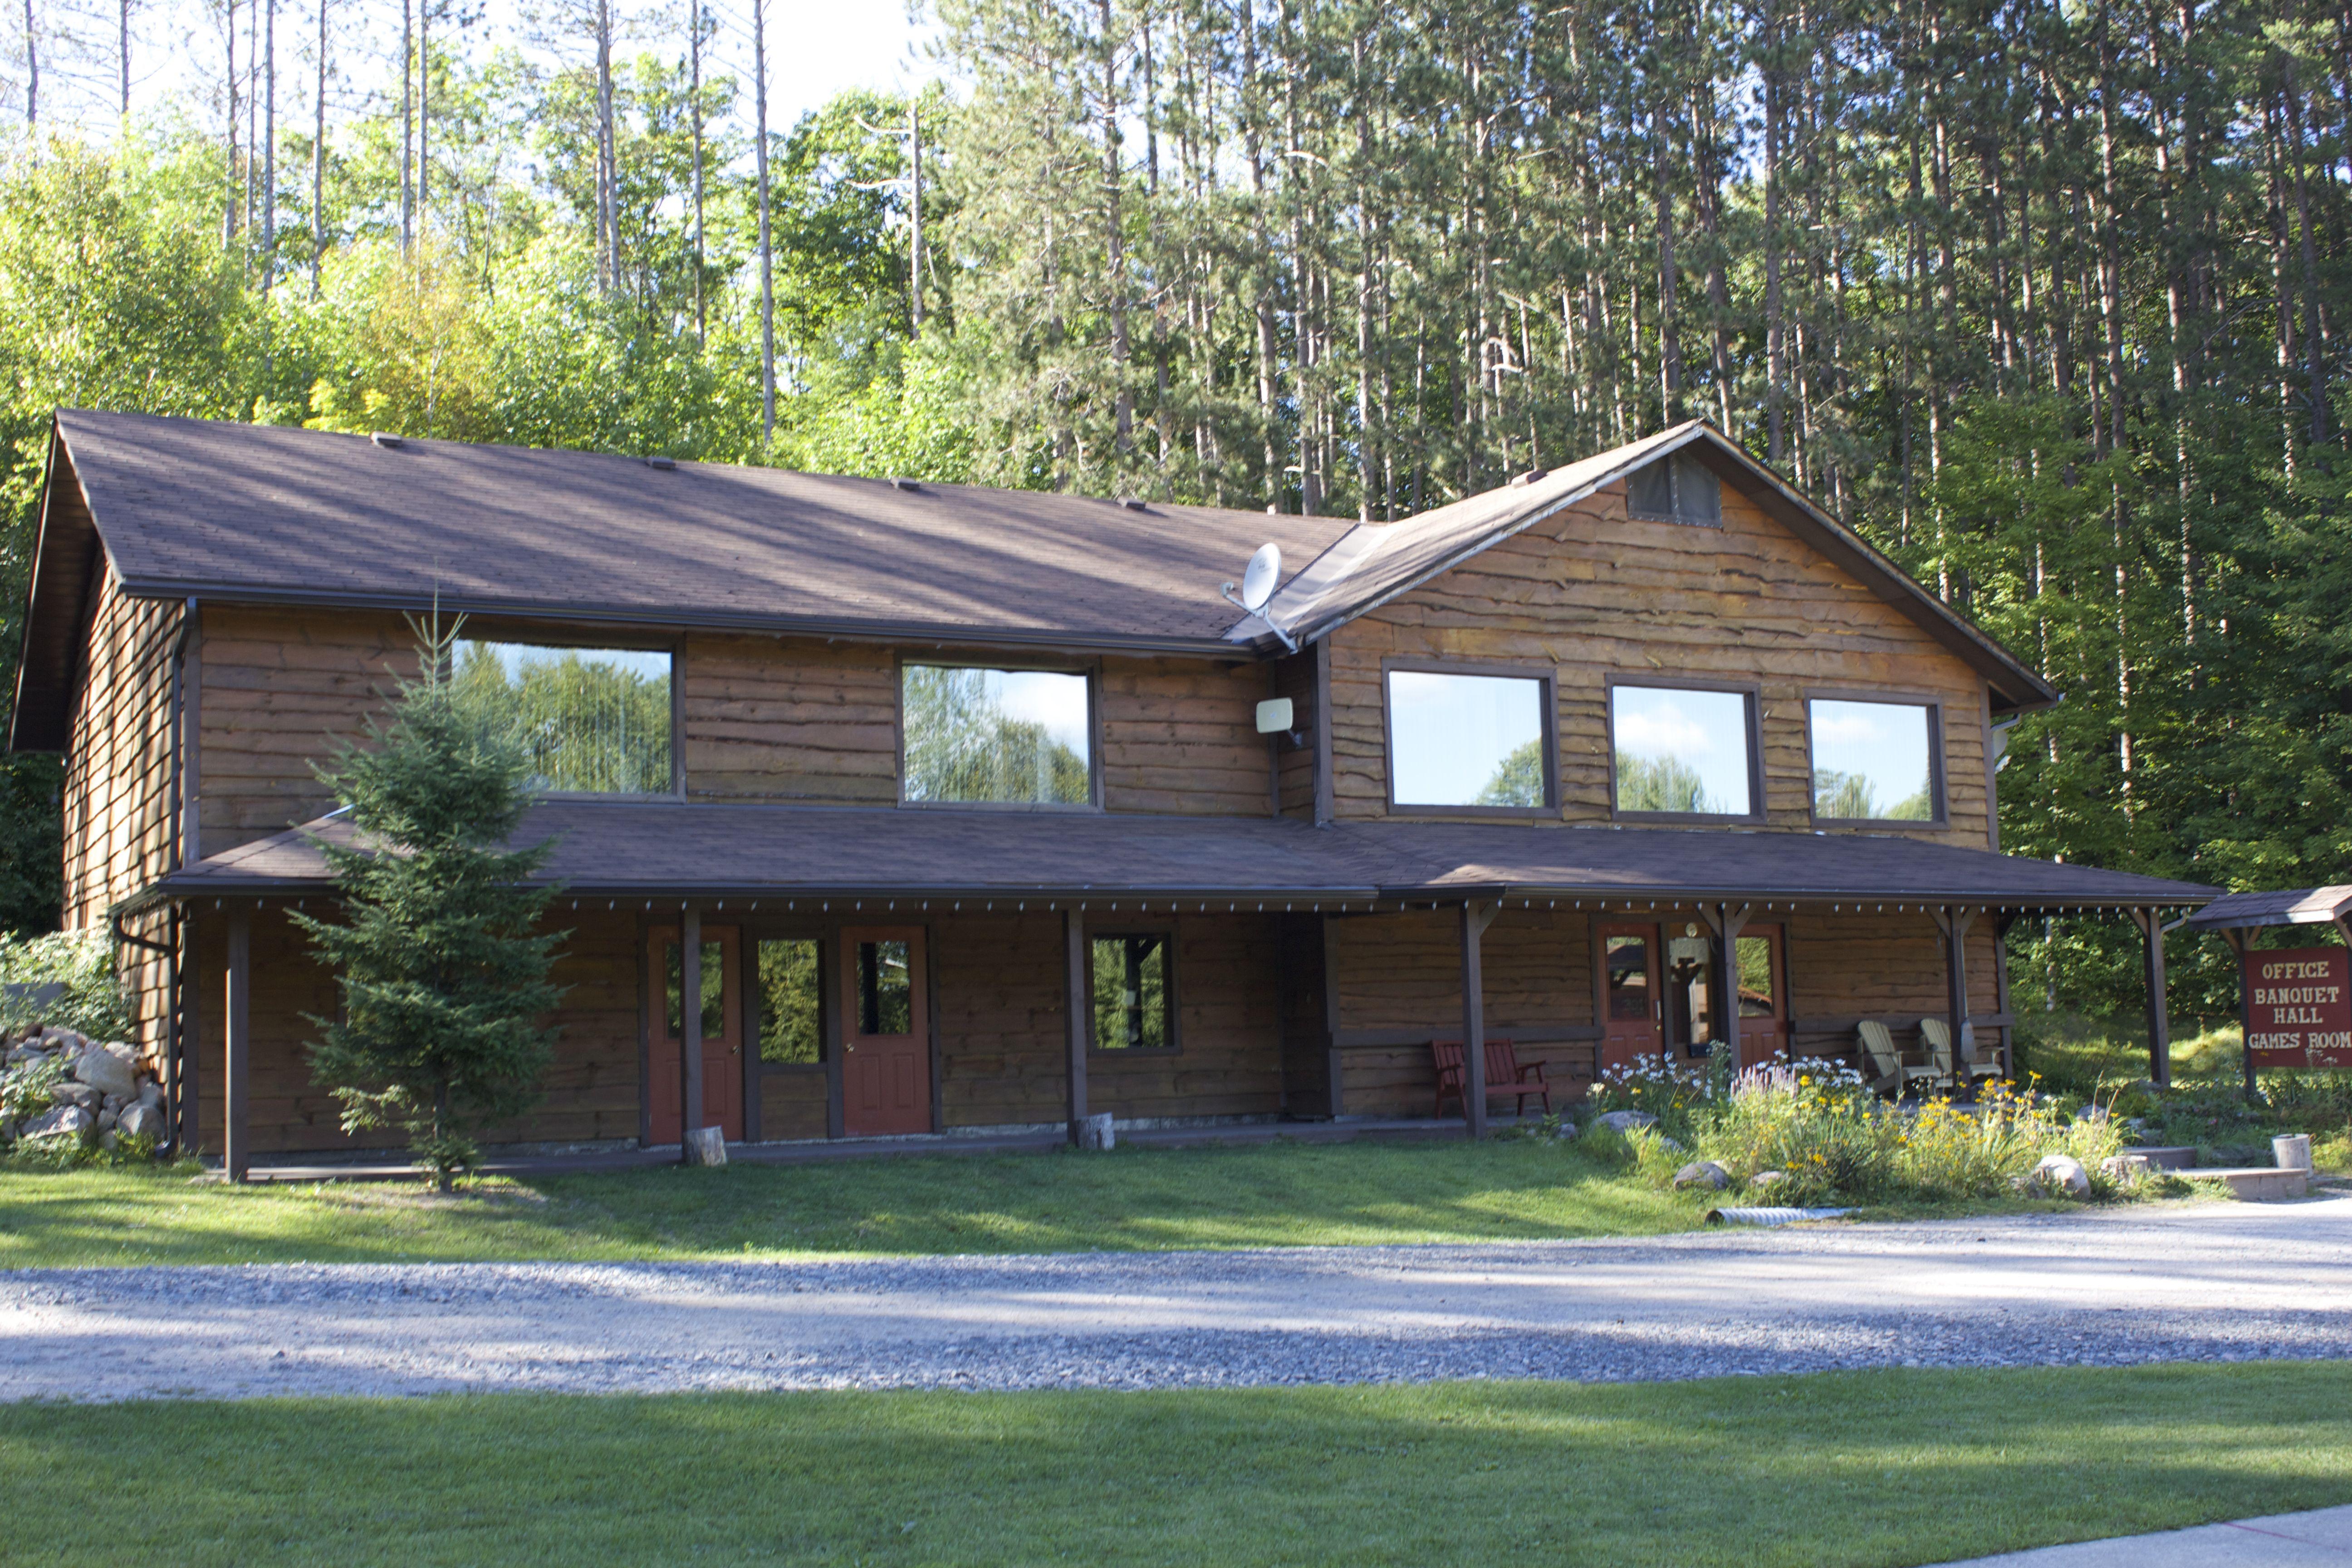 Fine Ontario Accommodations Haliburton Cottage Rentals Download Free Architecture Designs Embacsunscenecom